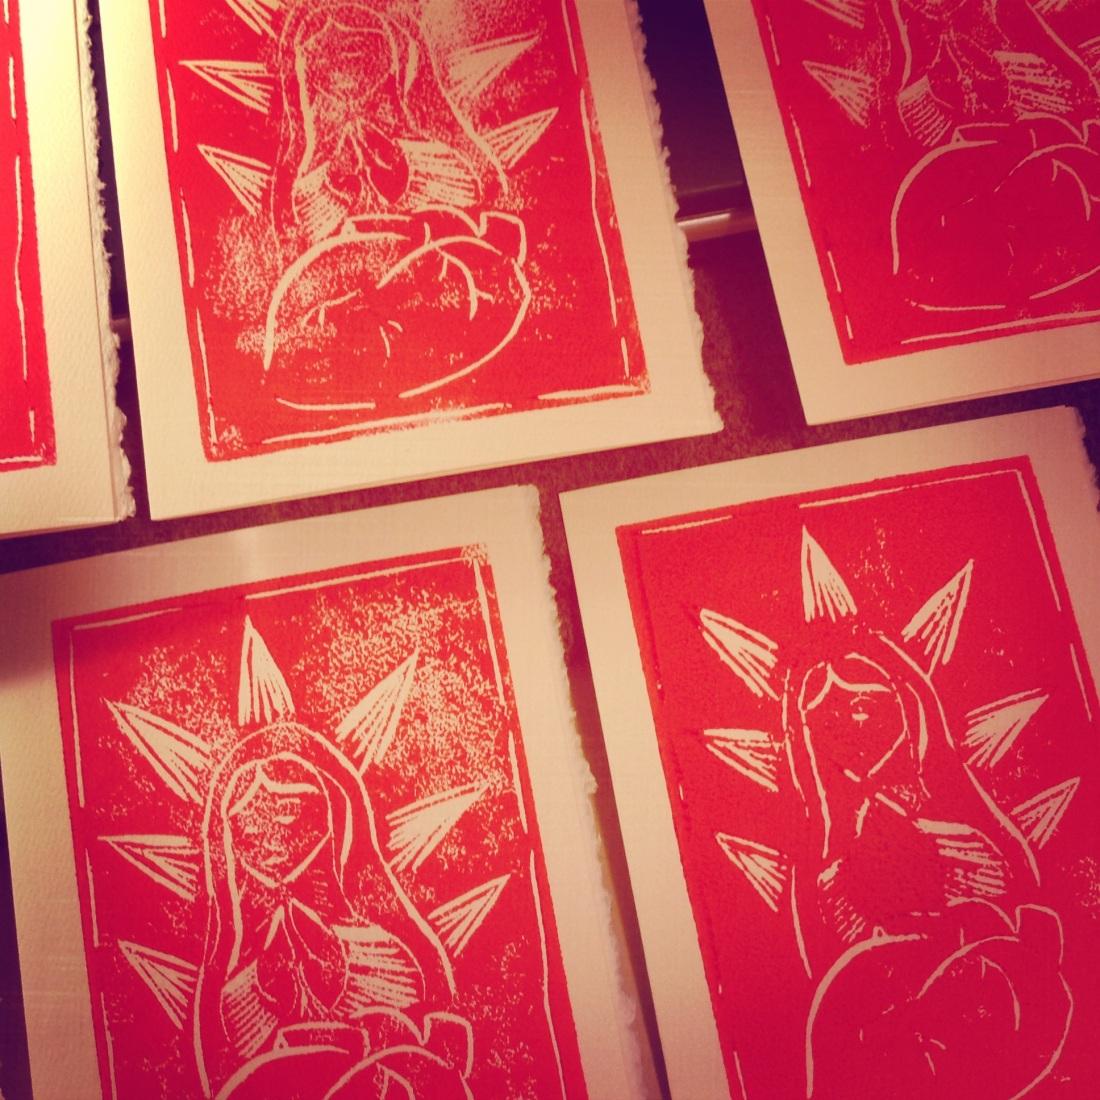 Linoleum print, 2014